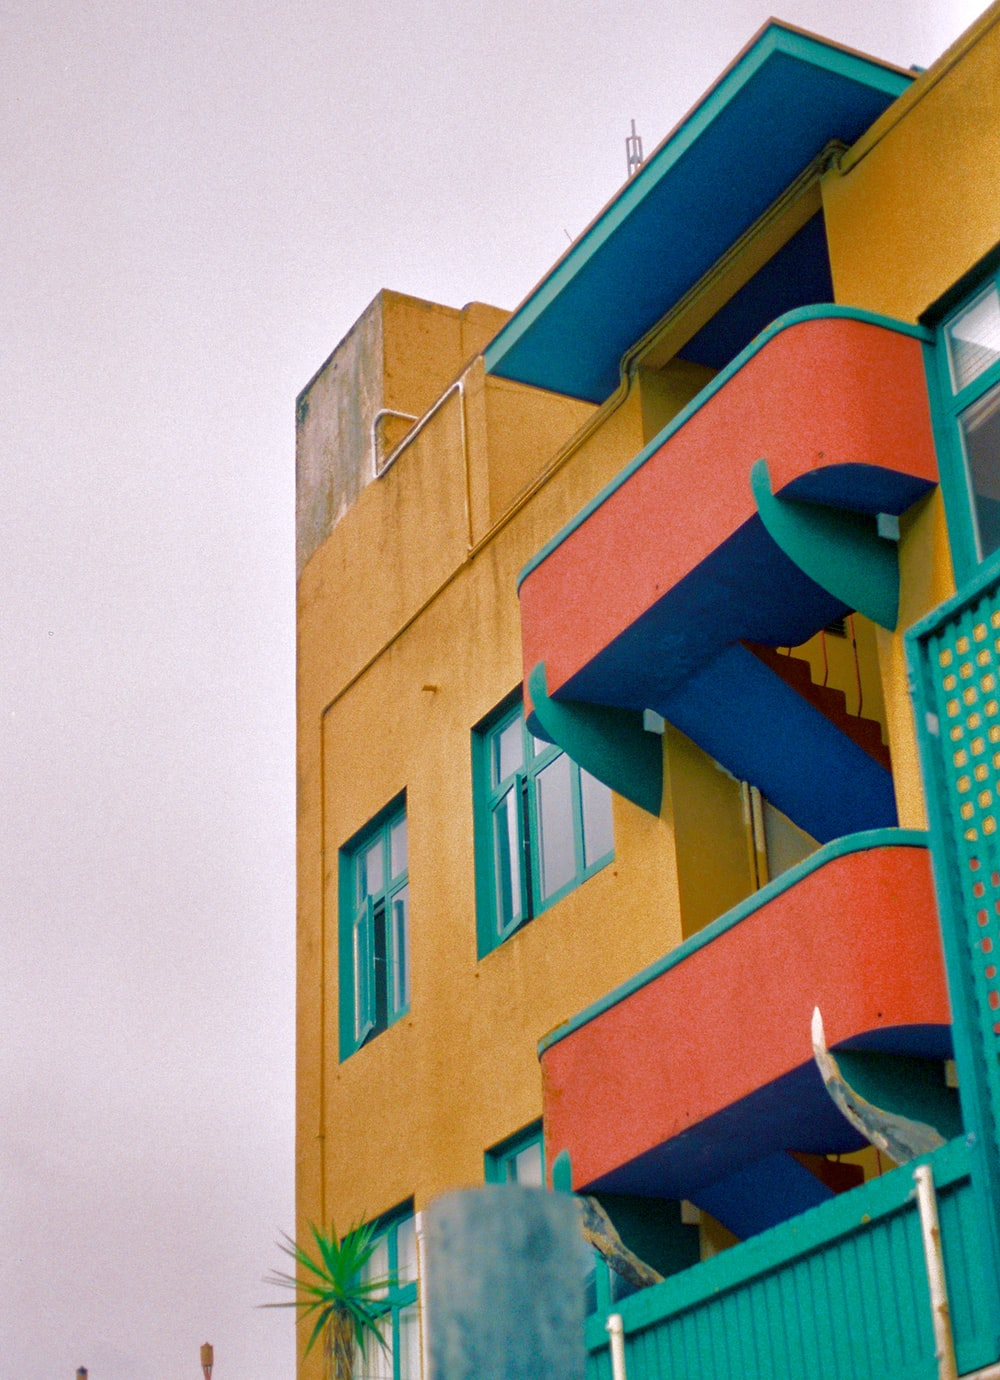 orange, blue, and yellow 4-storey building